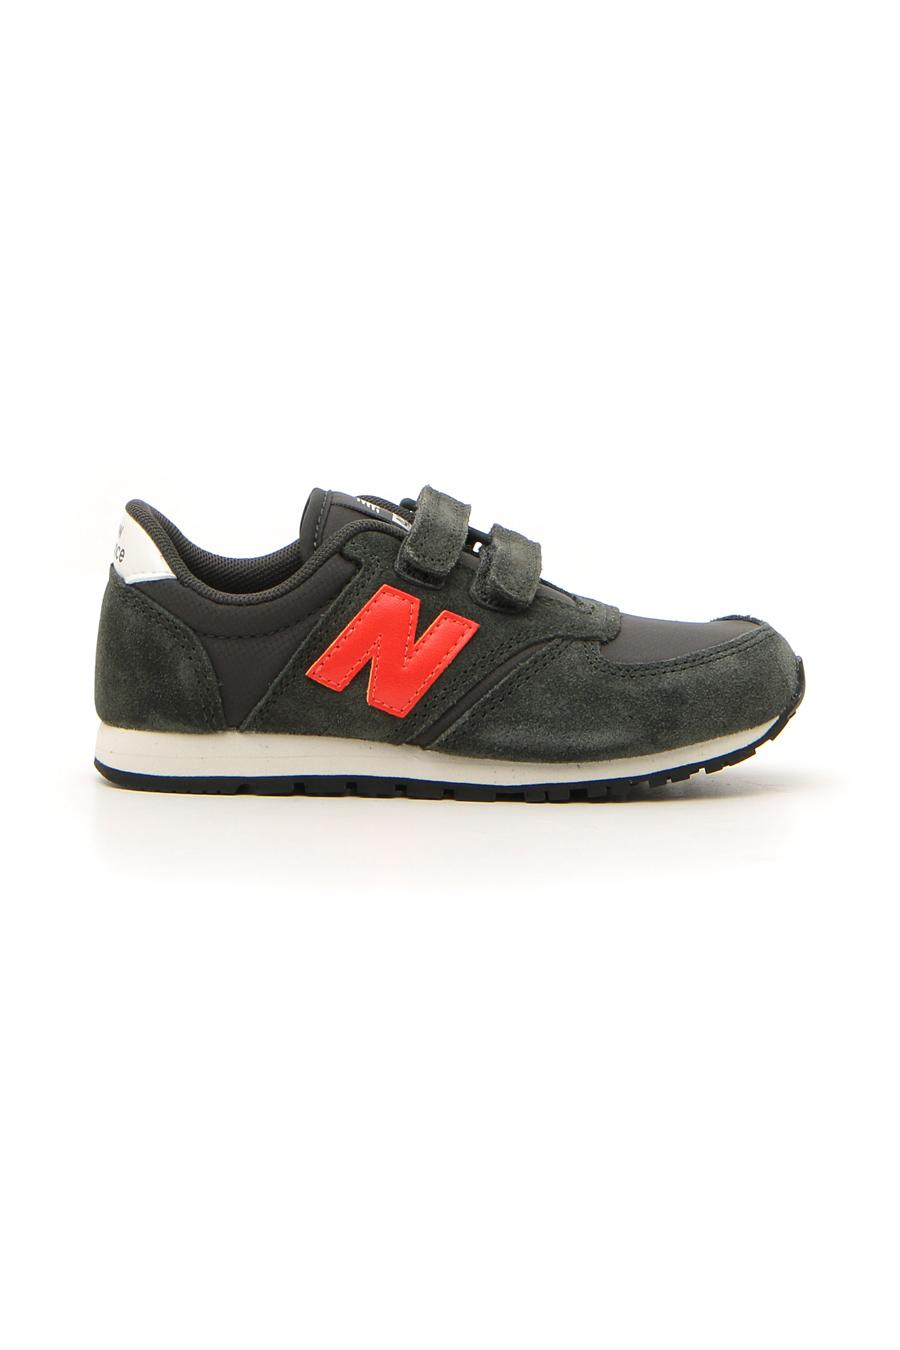 Sneakers New Balance 420 Verde e Rosso